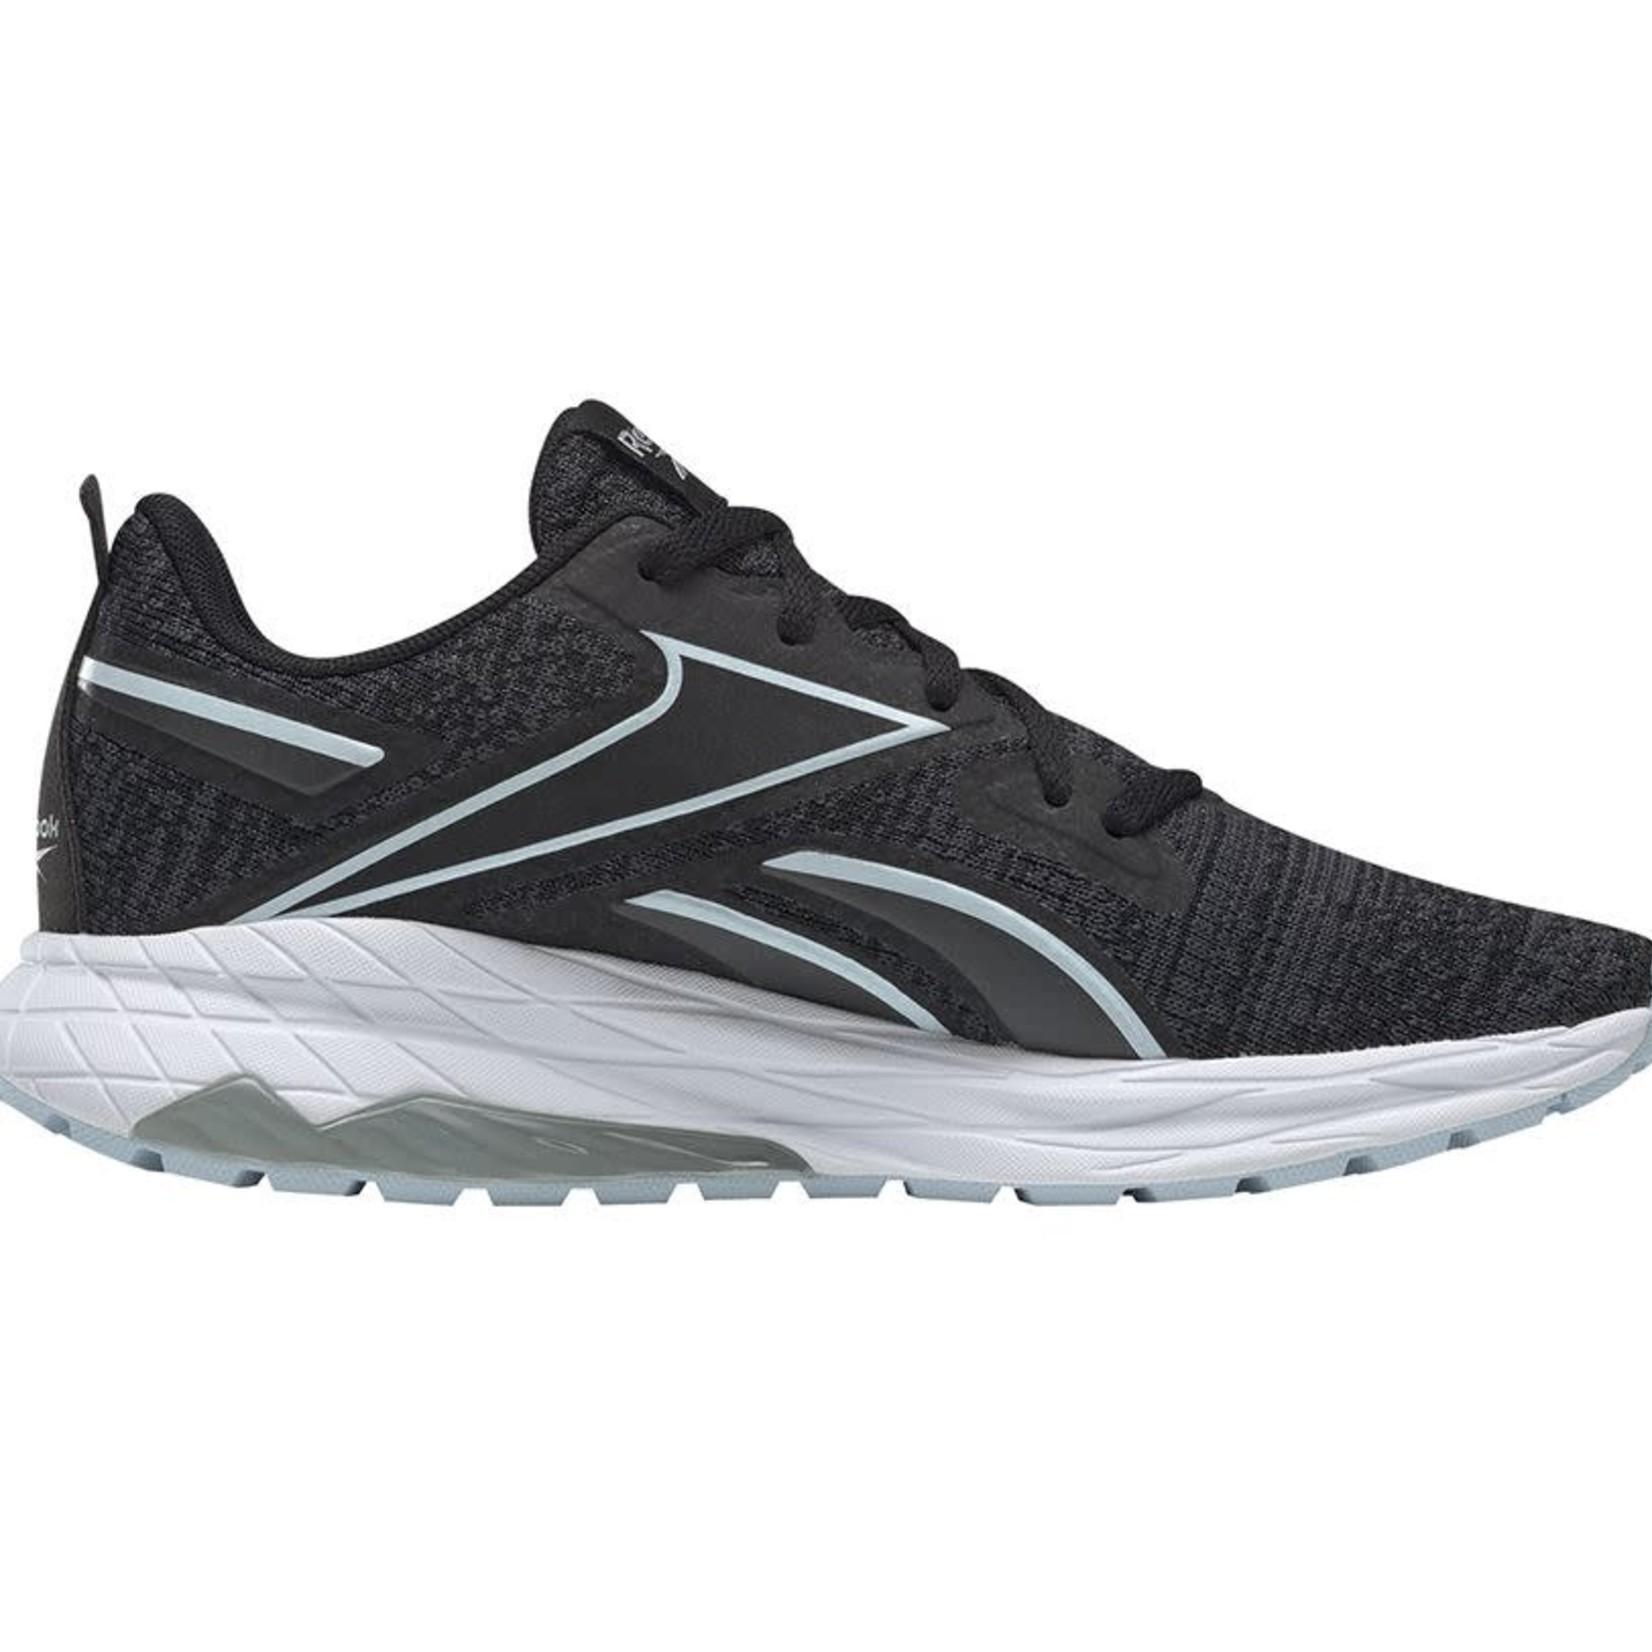 Reebok Reebok Footwear : Core Running Liquifect LS Shoes